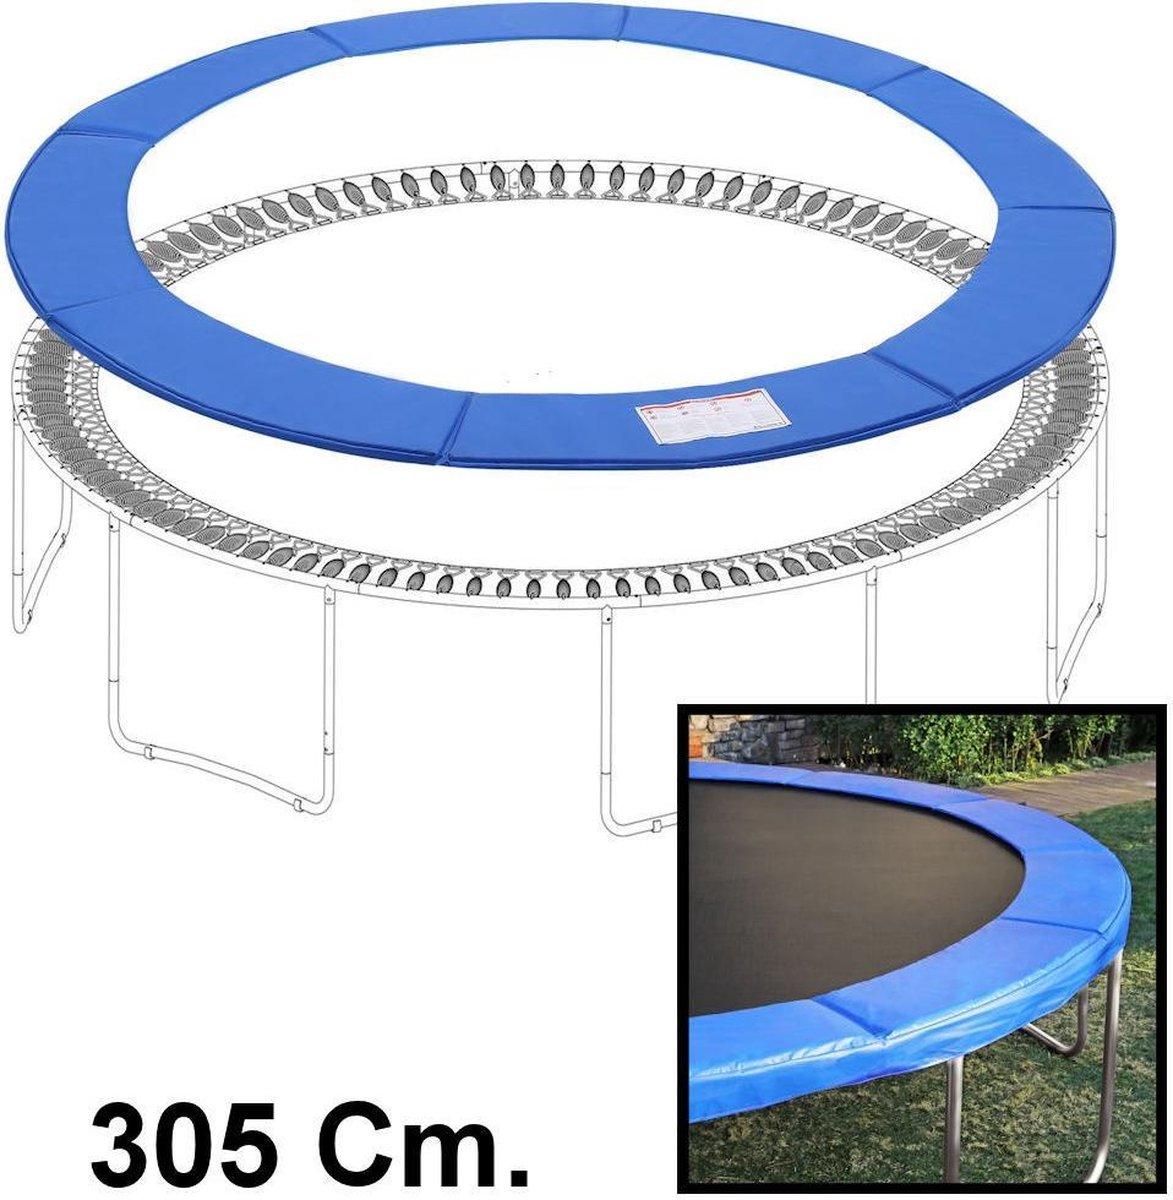 Sterke Trampolinerand 305 Cm diameter – Rond - Hoge kwaliteit beschermrand - Blauw - Trampoline rand afdekking universeel - Beschermrand voor Trampoli